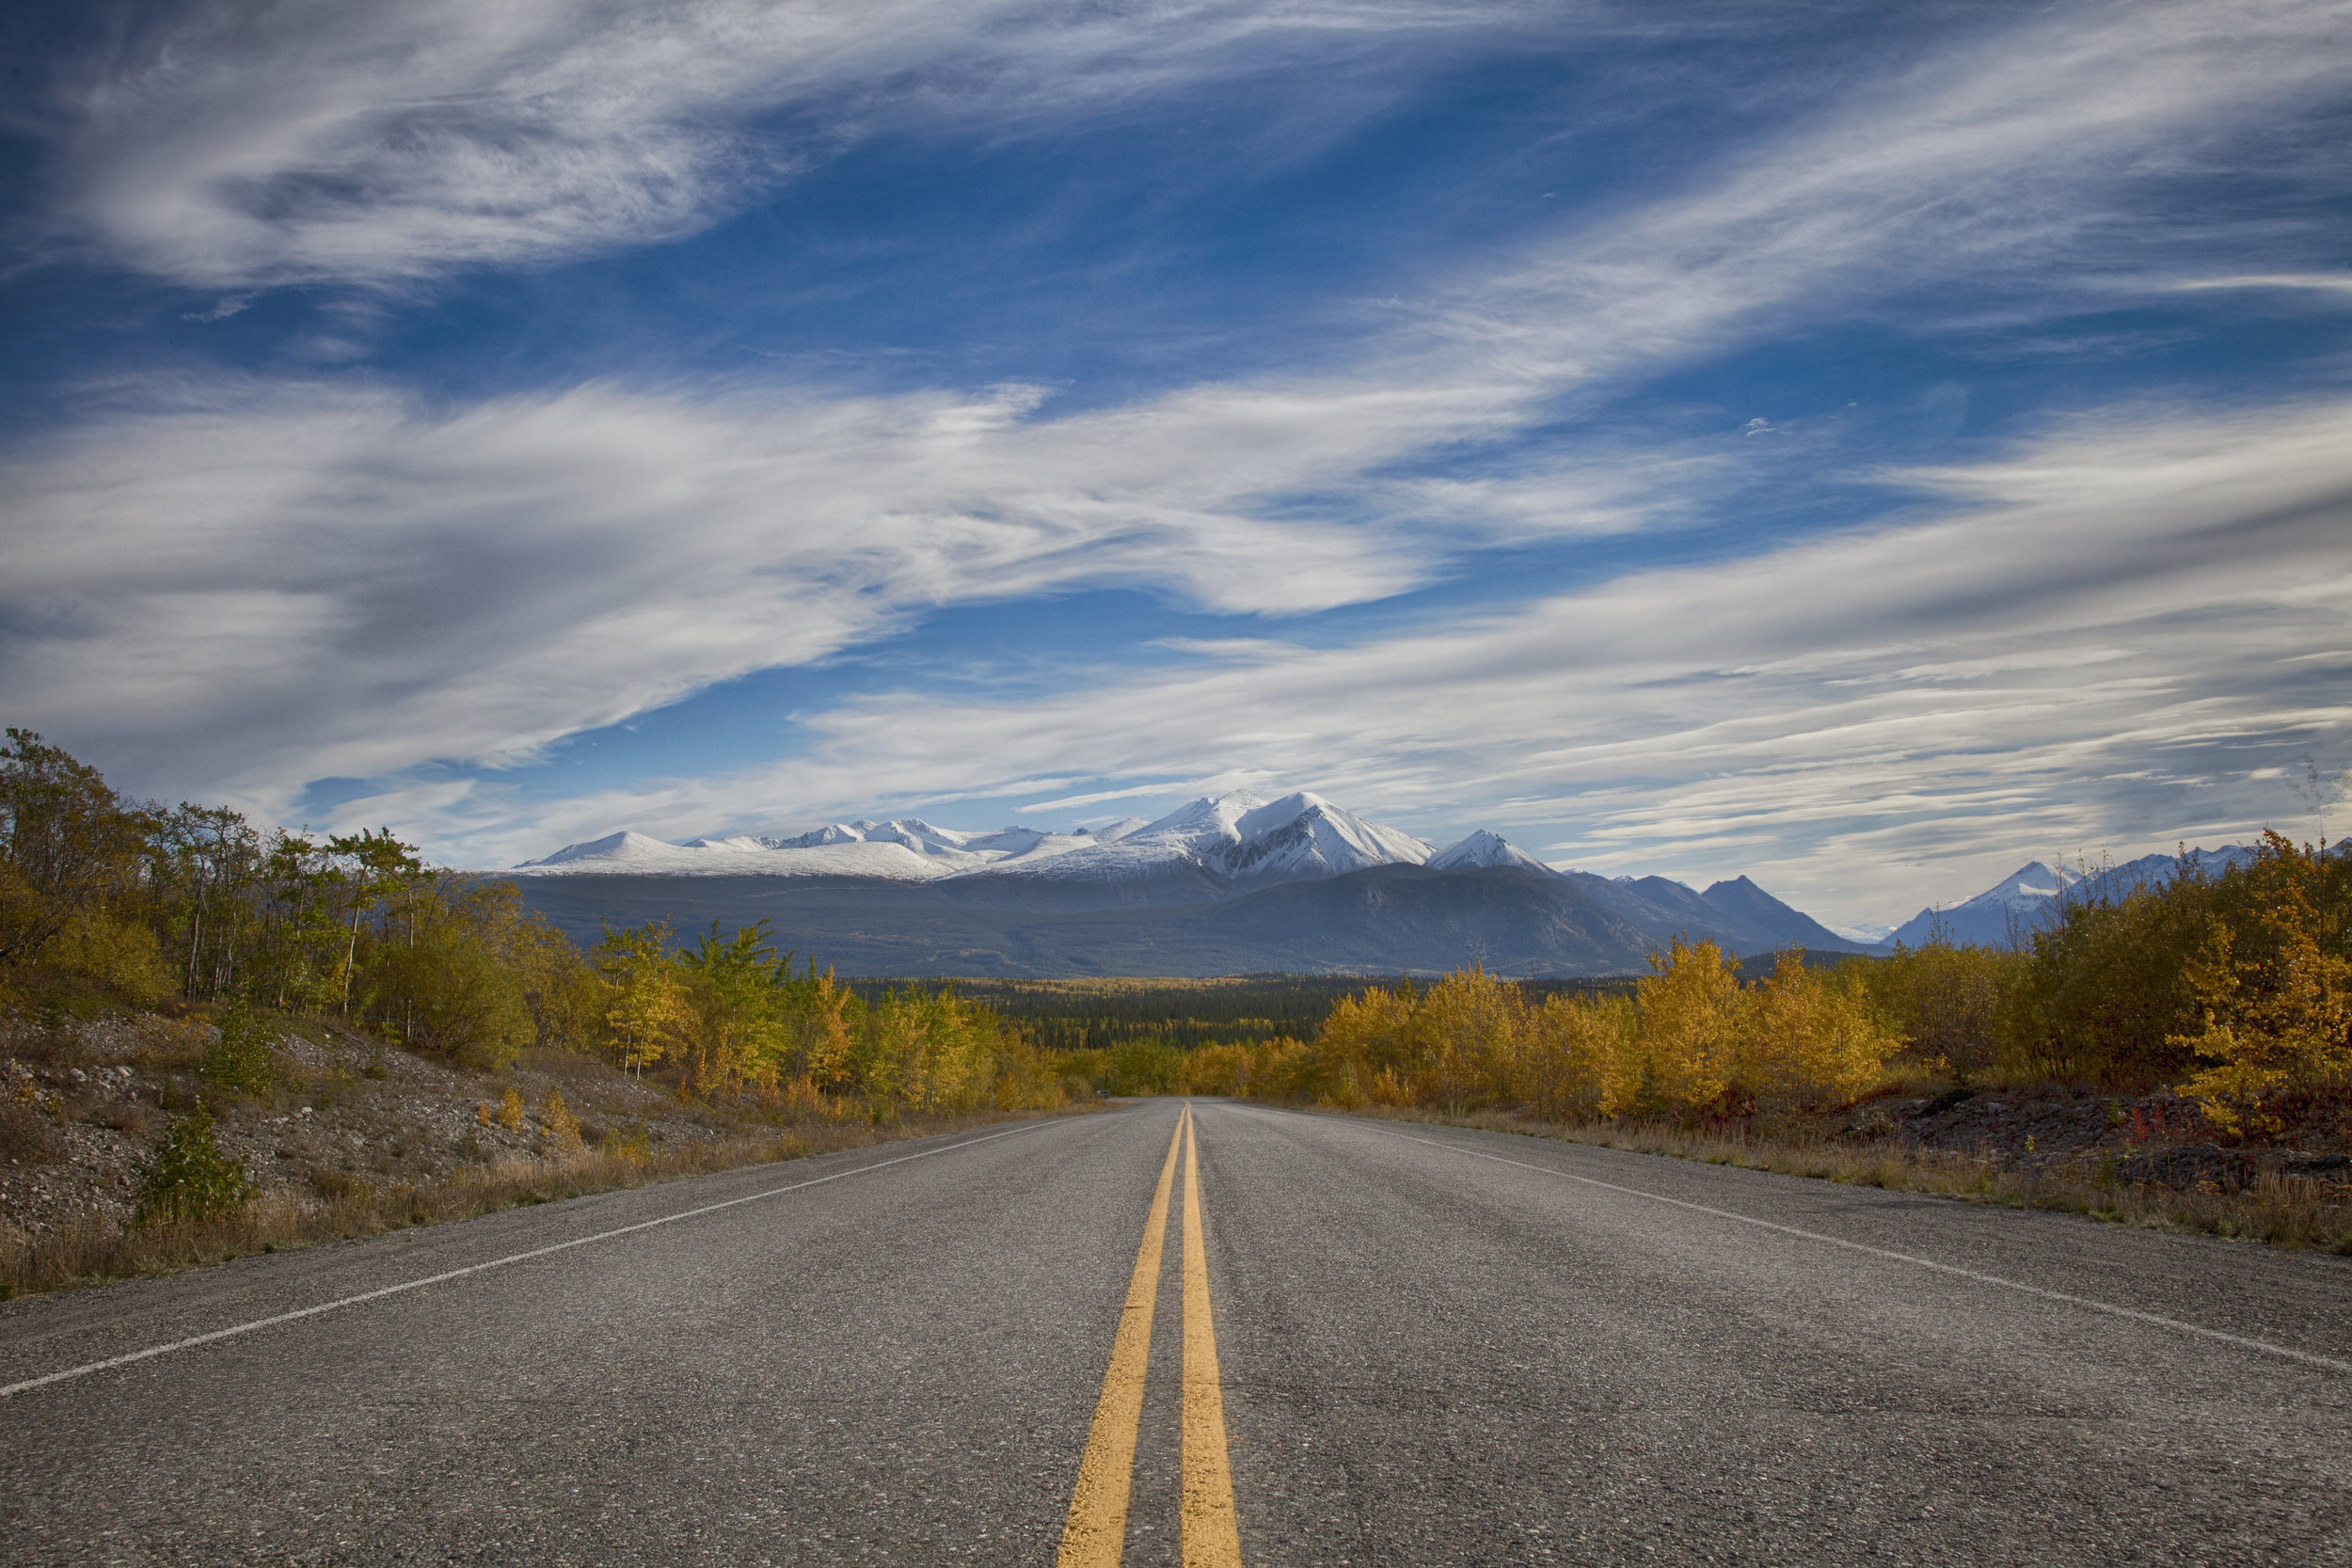 Yukon Territory - Across the Blue Planet